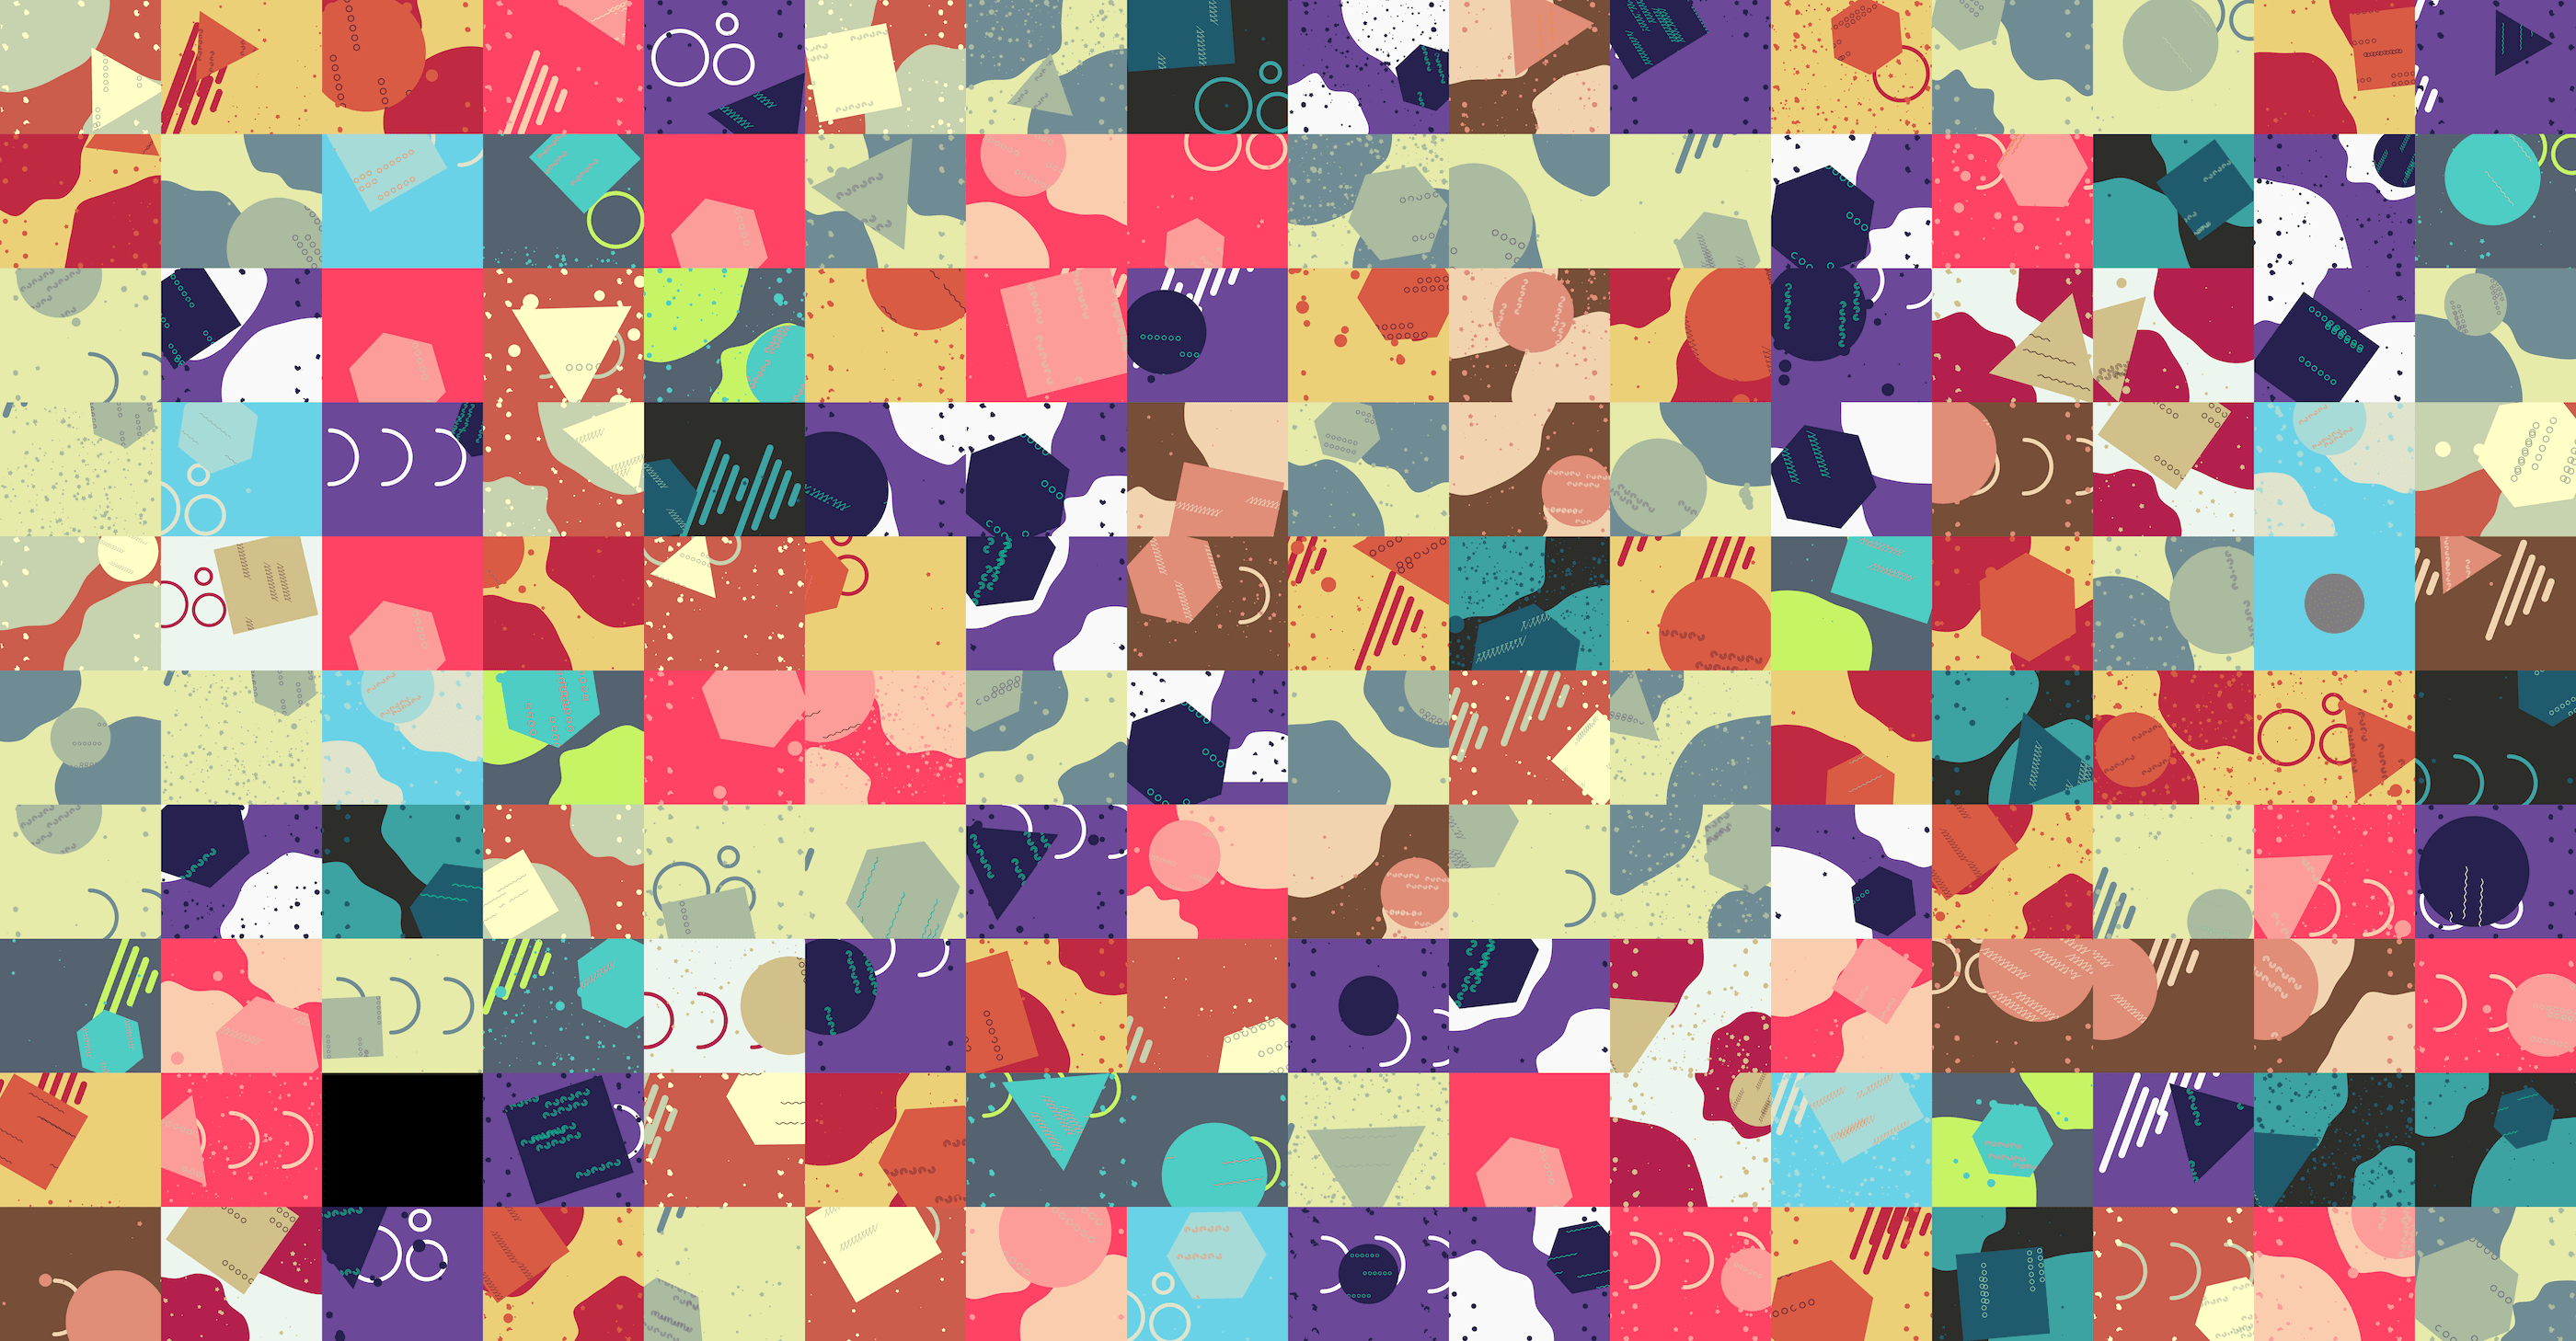 rde_mosaic